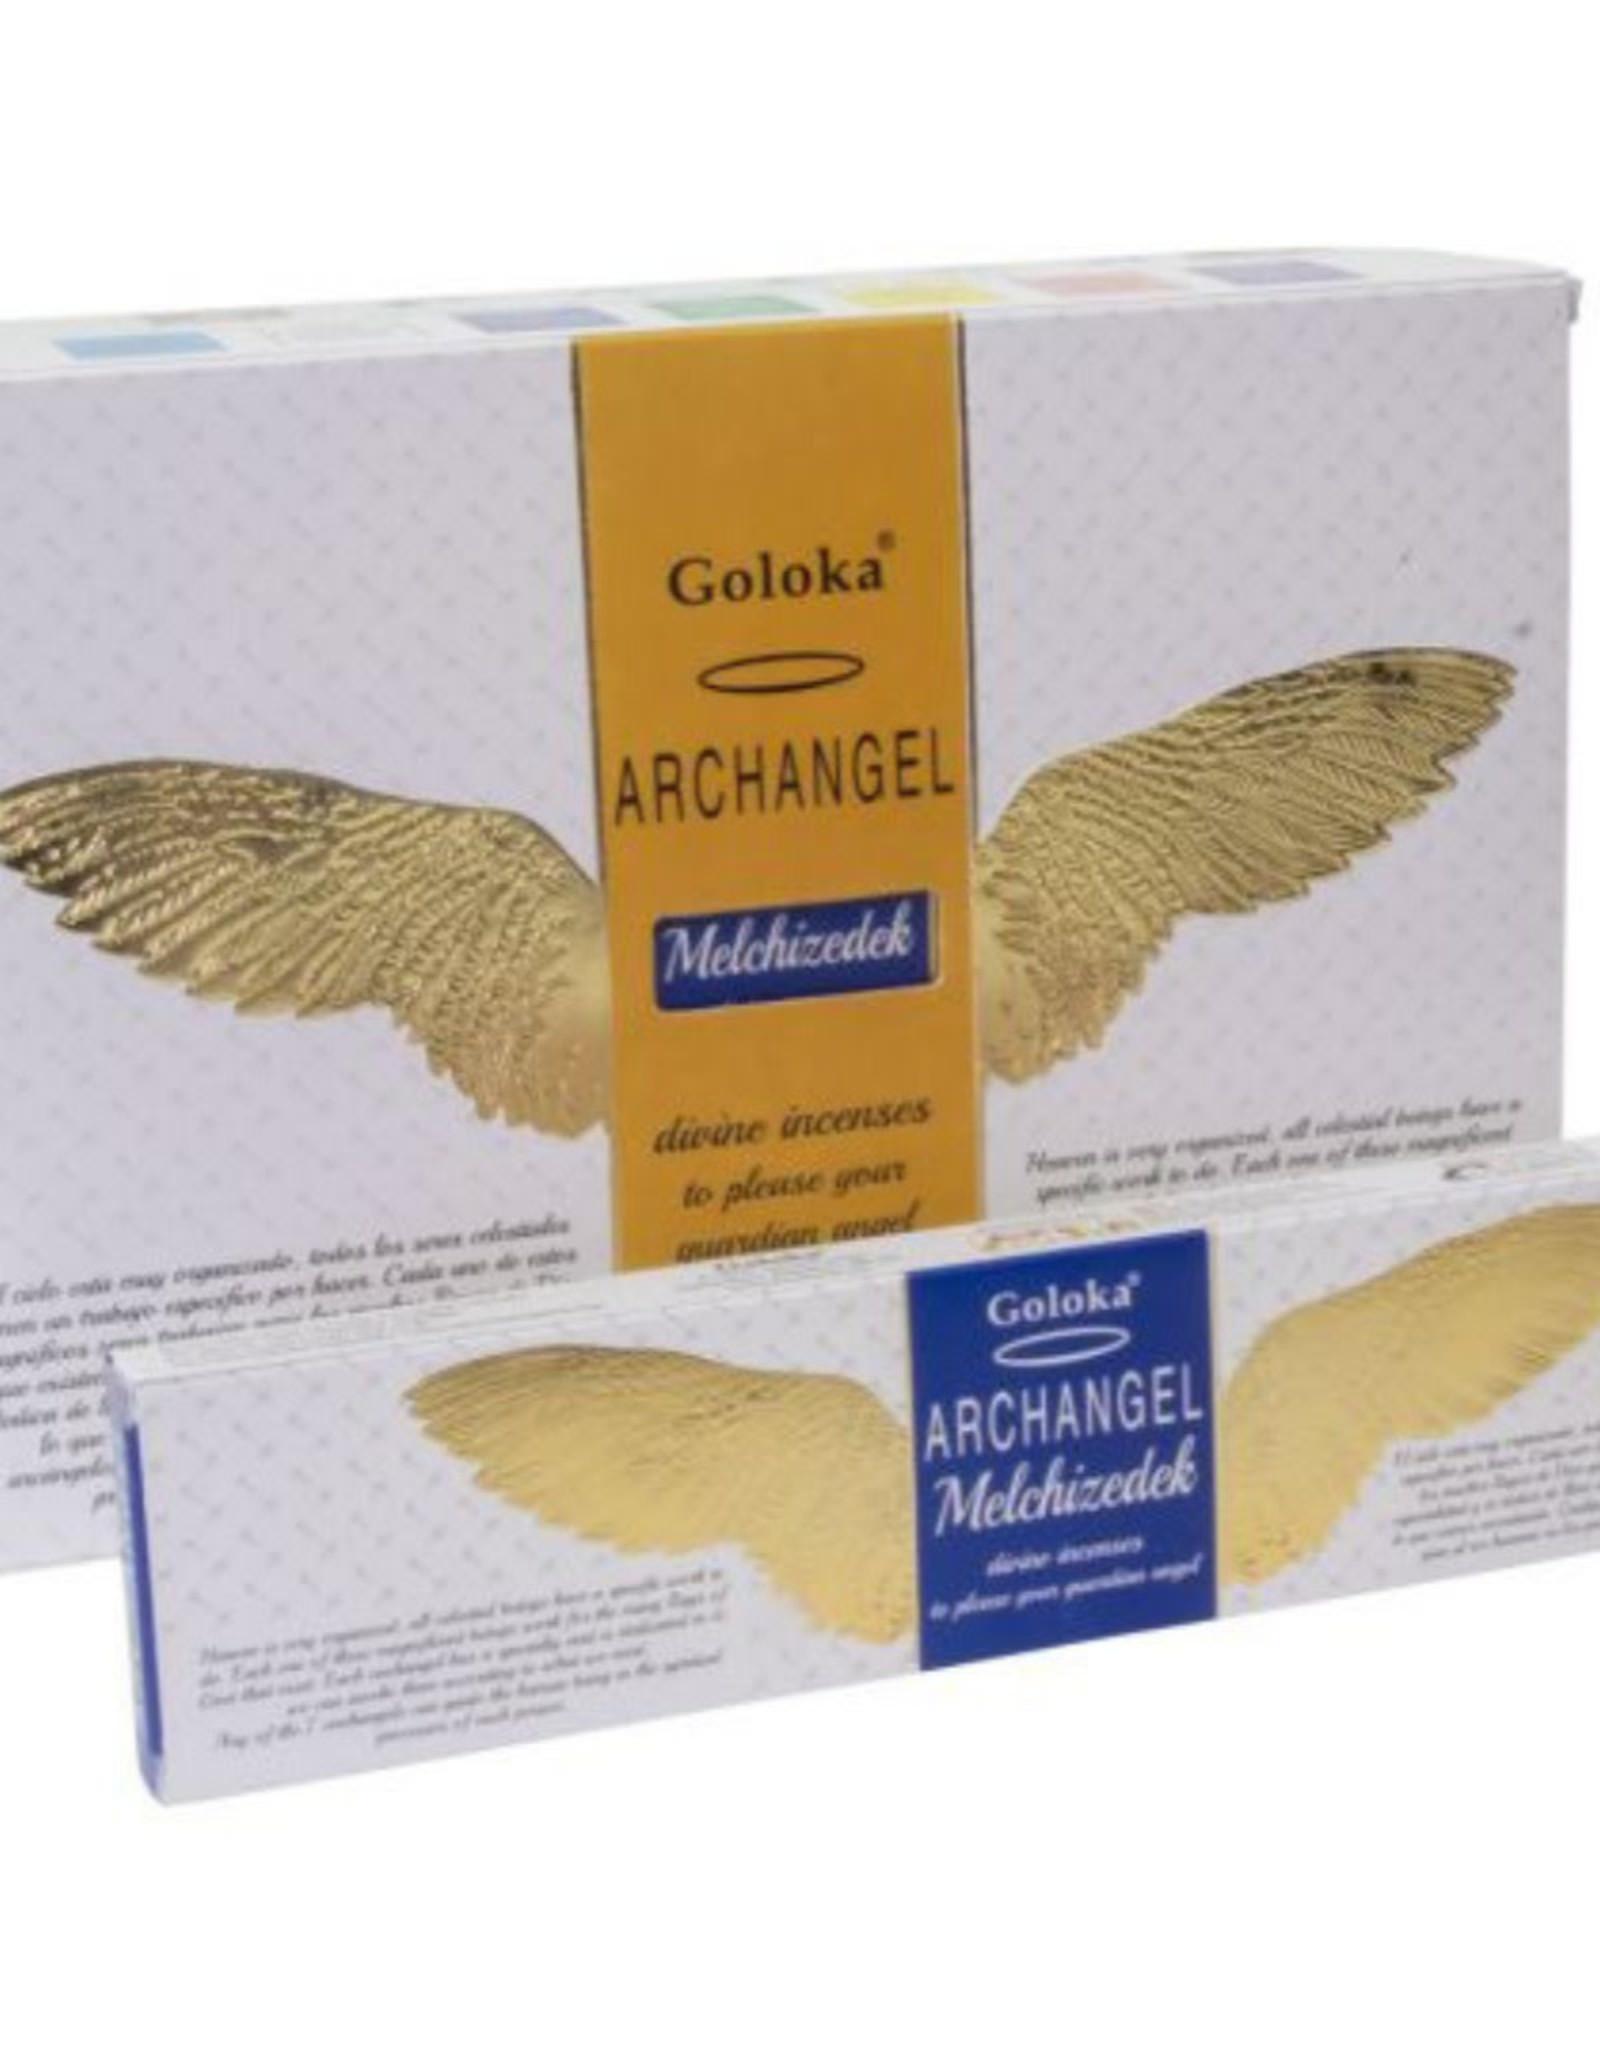 GOLOKA Archangel Melchizedek Incense Sticks